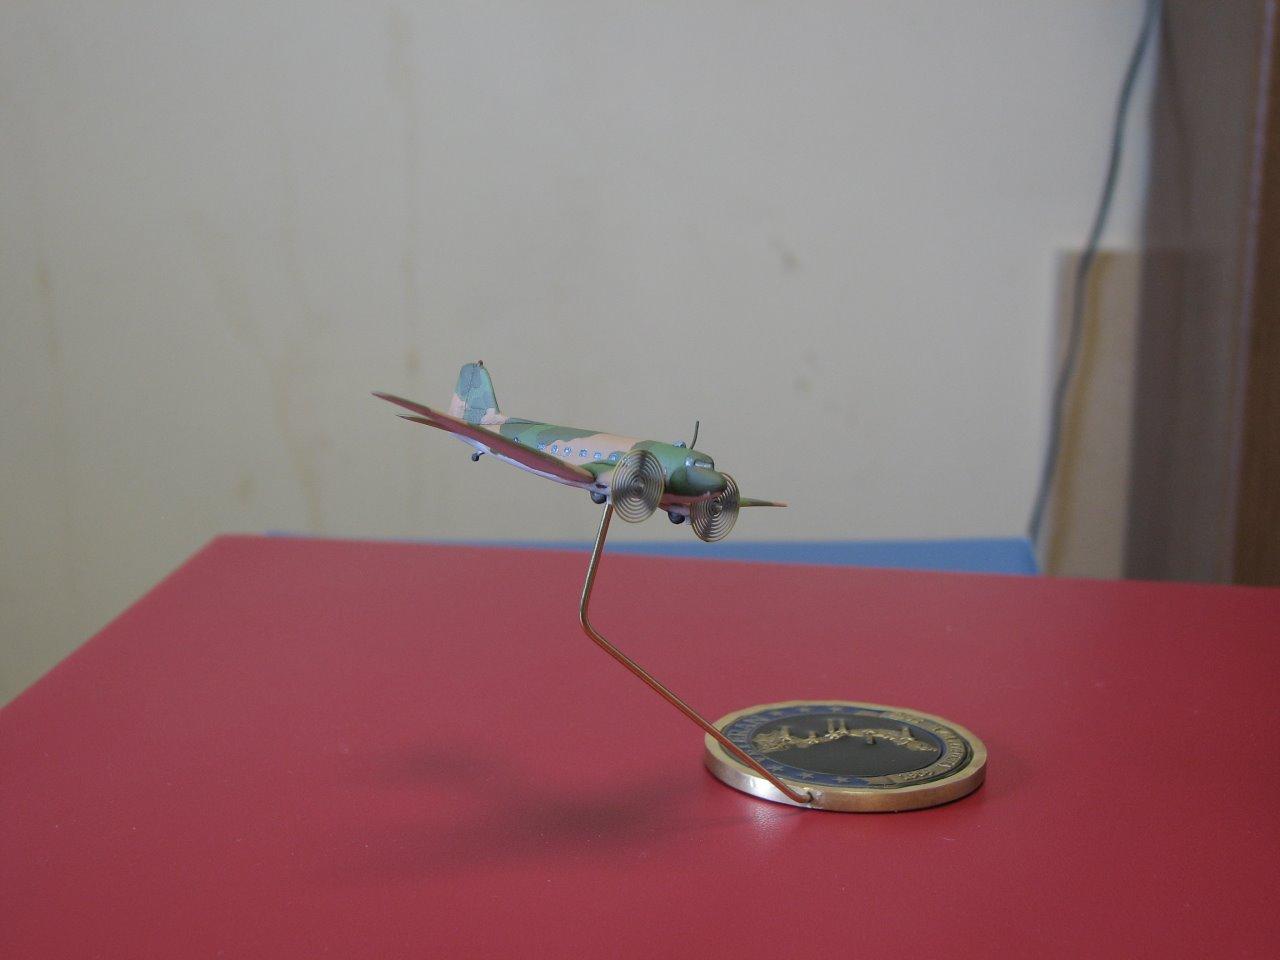 AC-47